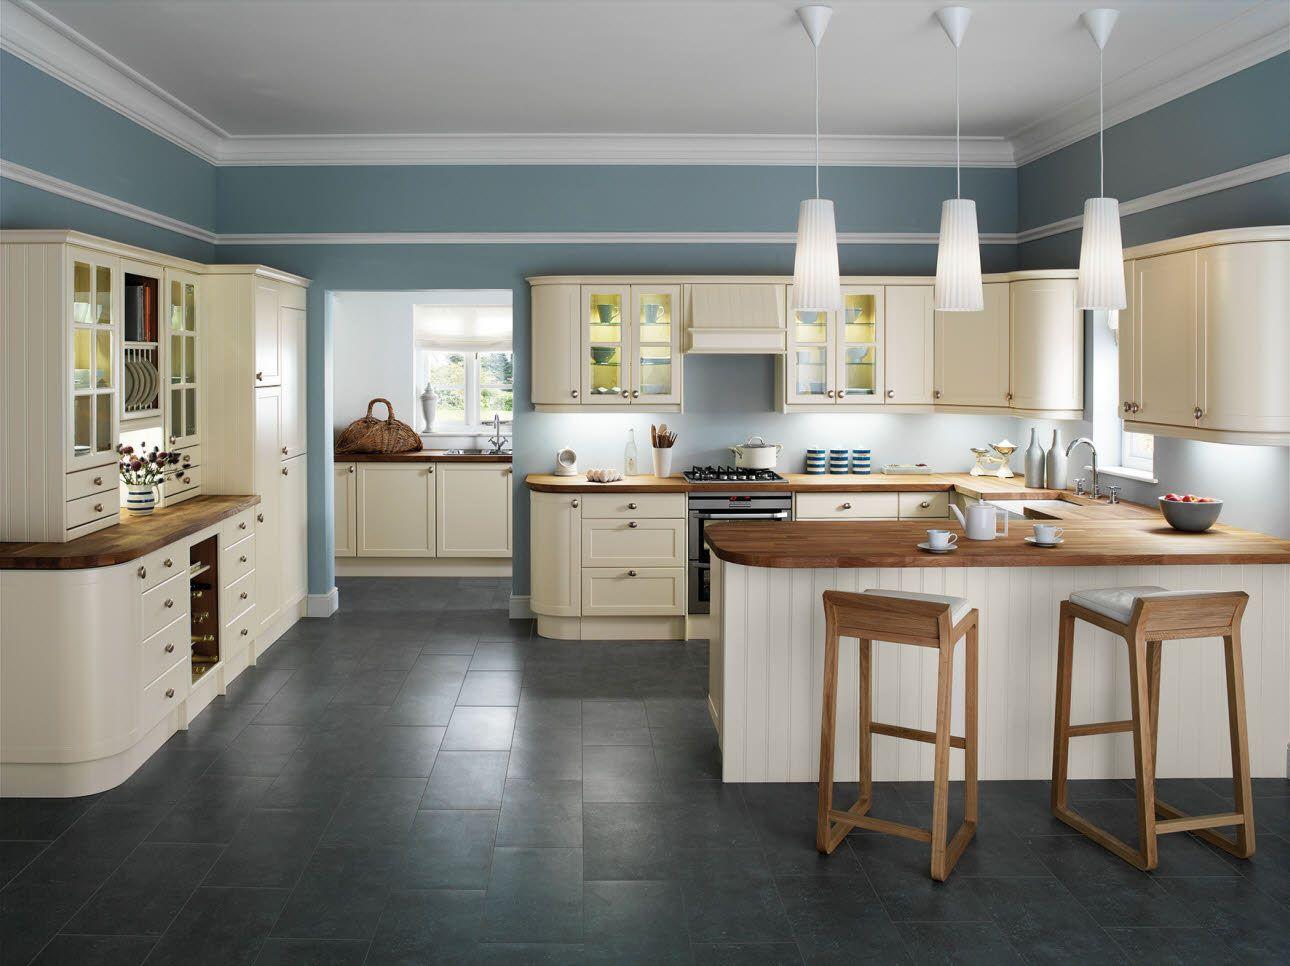 kitchen & bath remodeling sofia cream kitchen 1 Kitchen Pinterest Cream gloss kitchen Cream kitchens and Cream